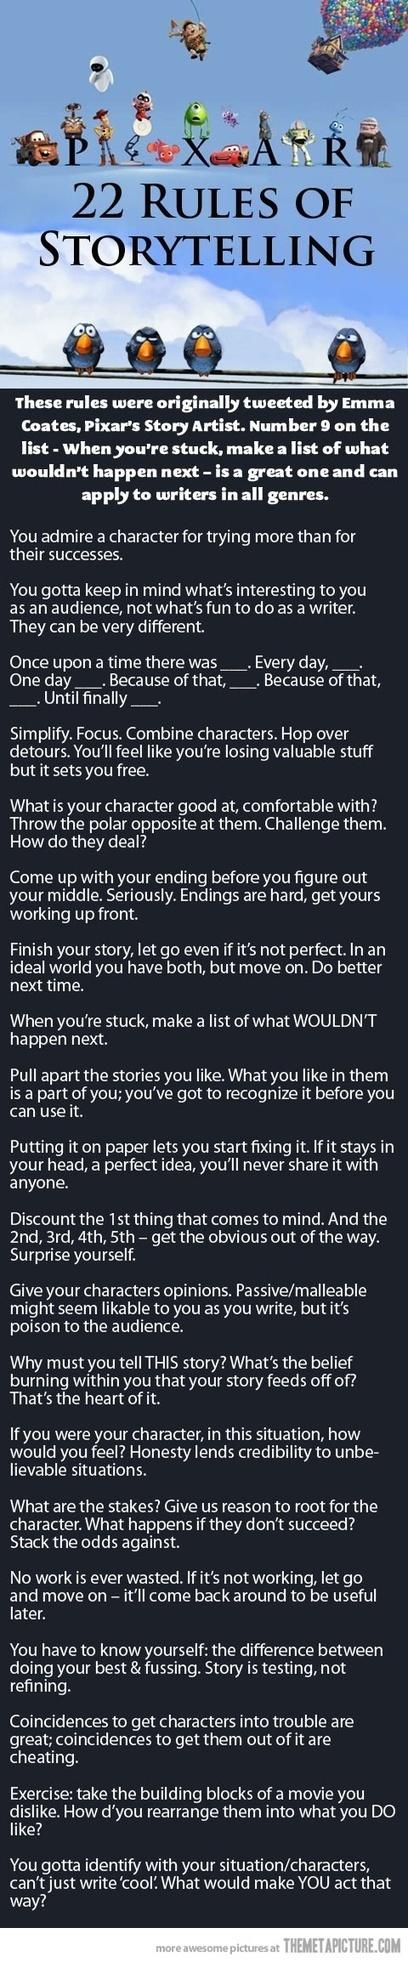 Pixar's  22 Rules Of Storytelling by Emma Coates,Pixar's Story Artist | Storytelling Content Transmedia | Scoop.it